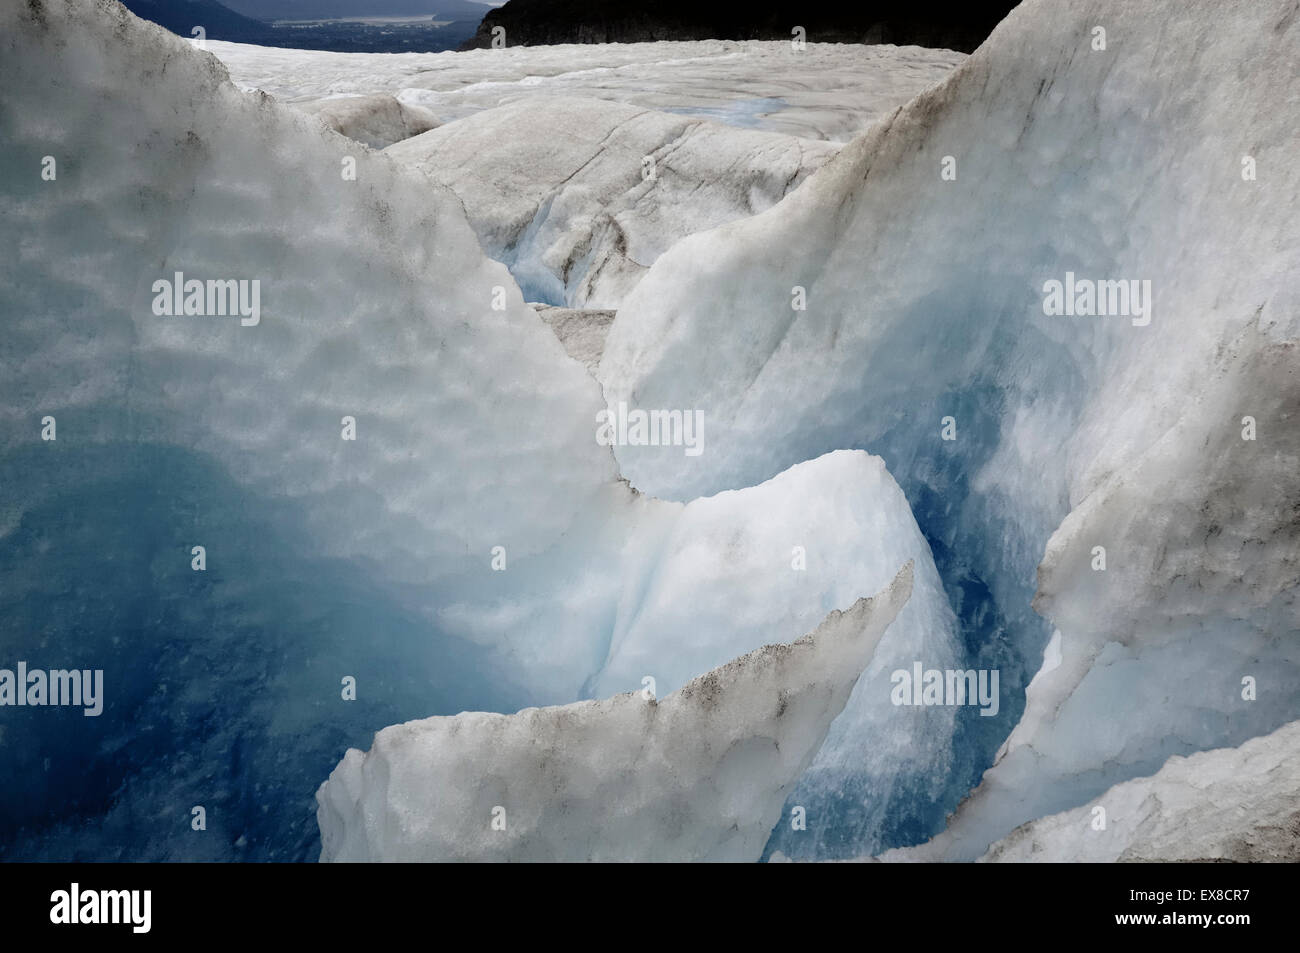 Moulin at Mendenhall Glacier, Juneau, Alaska - Stock Image